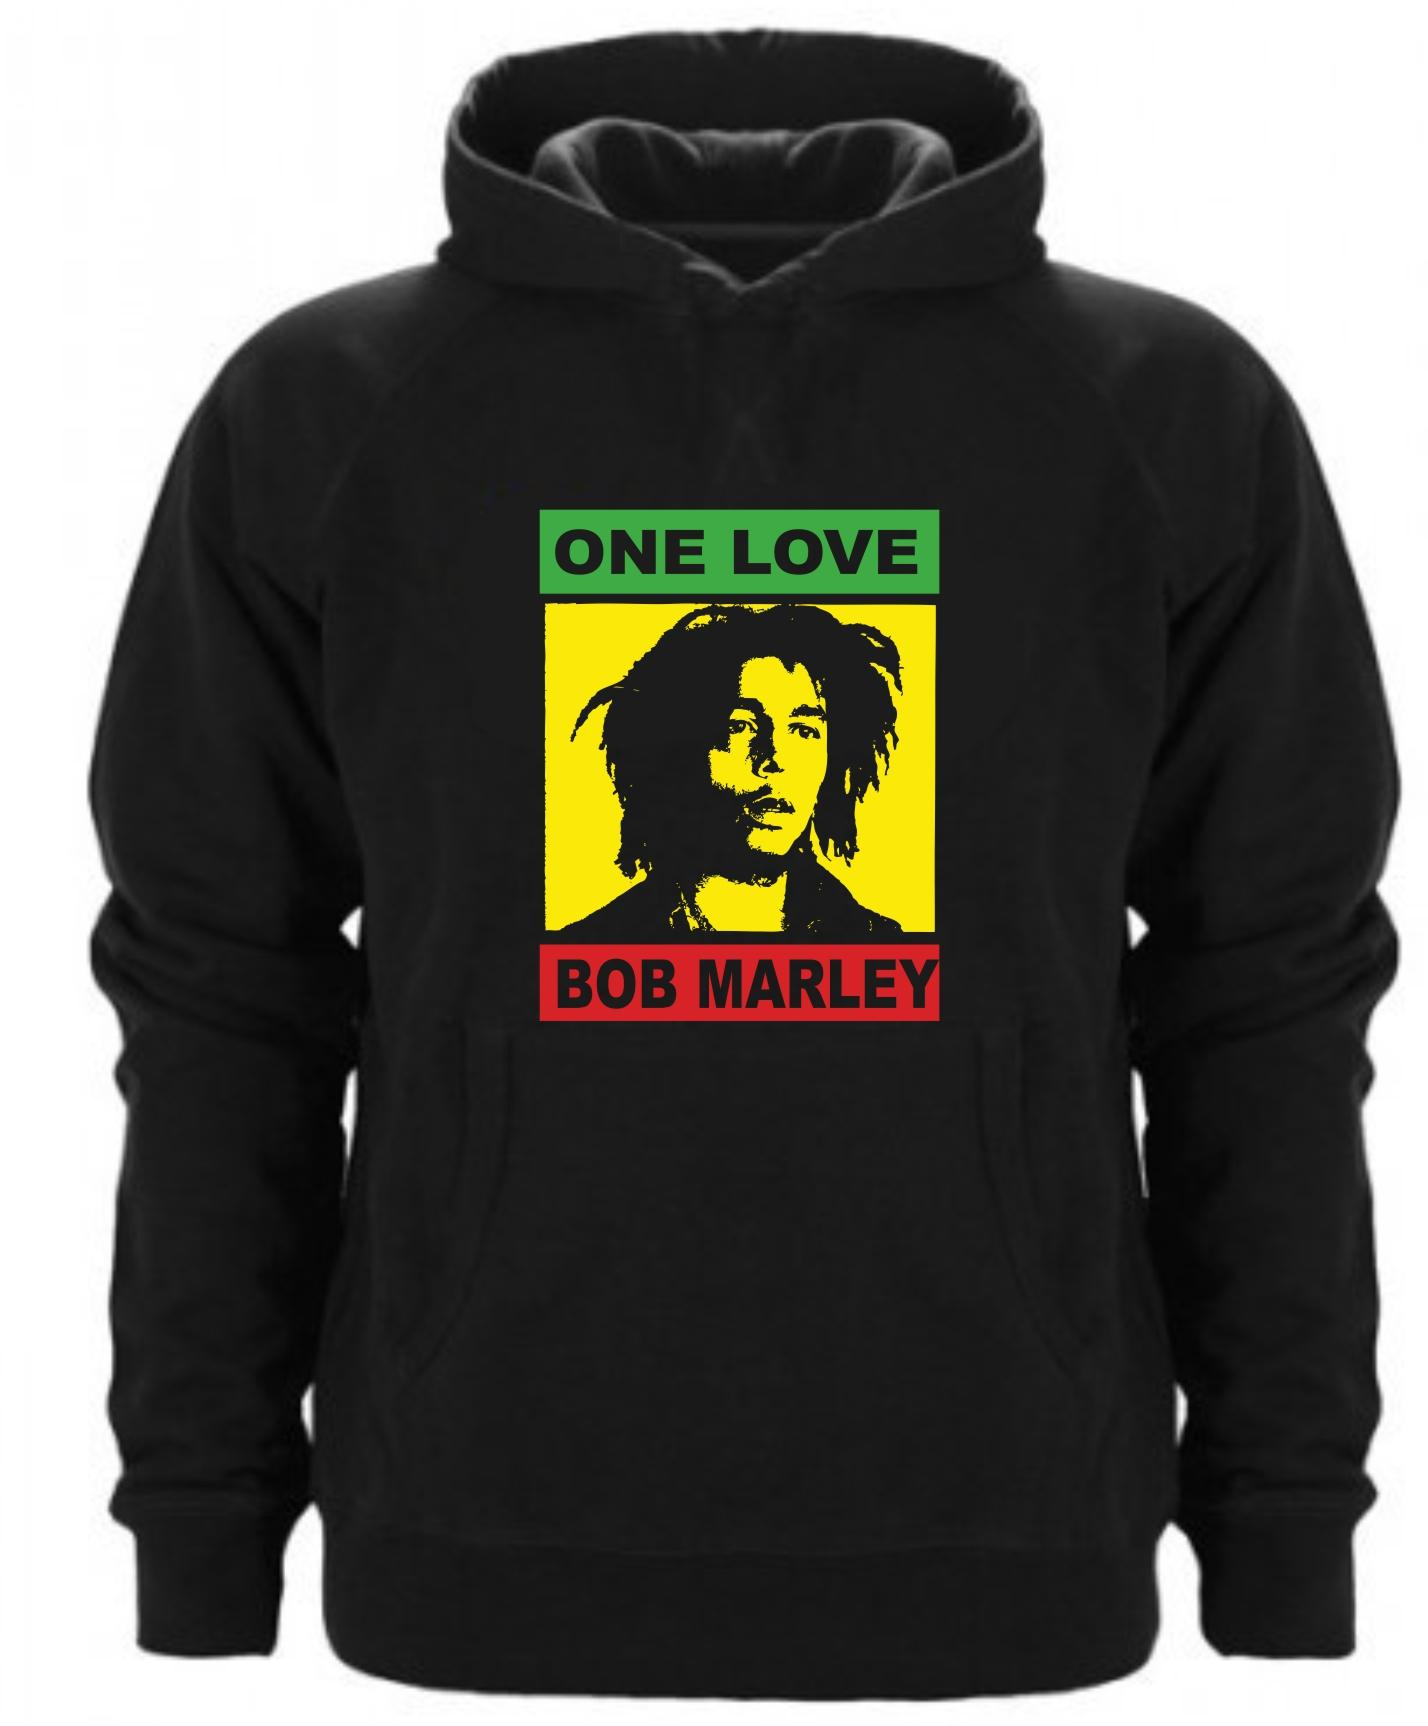 SUDADERA CAPUCHA ONE LOVE BOB MARLEY